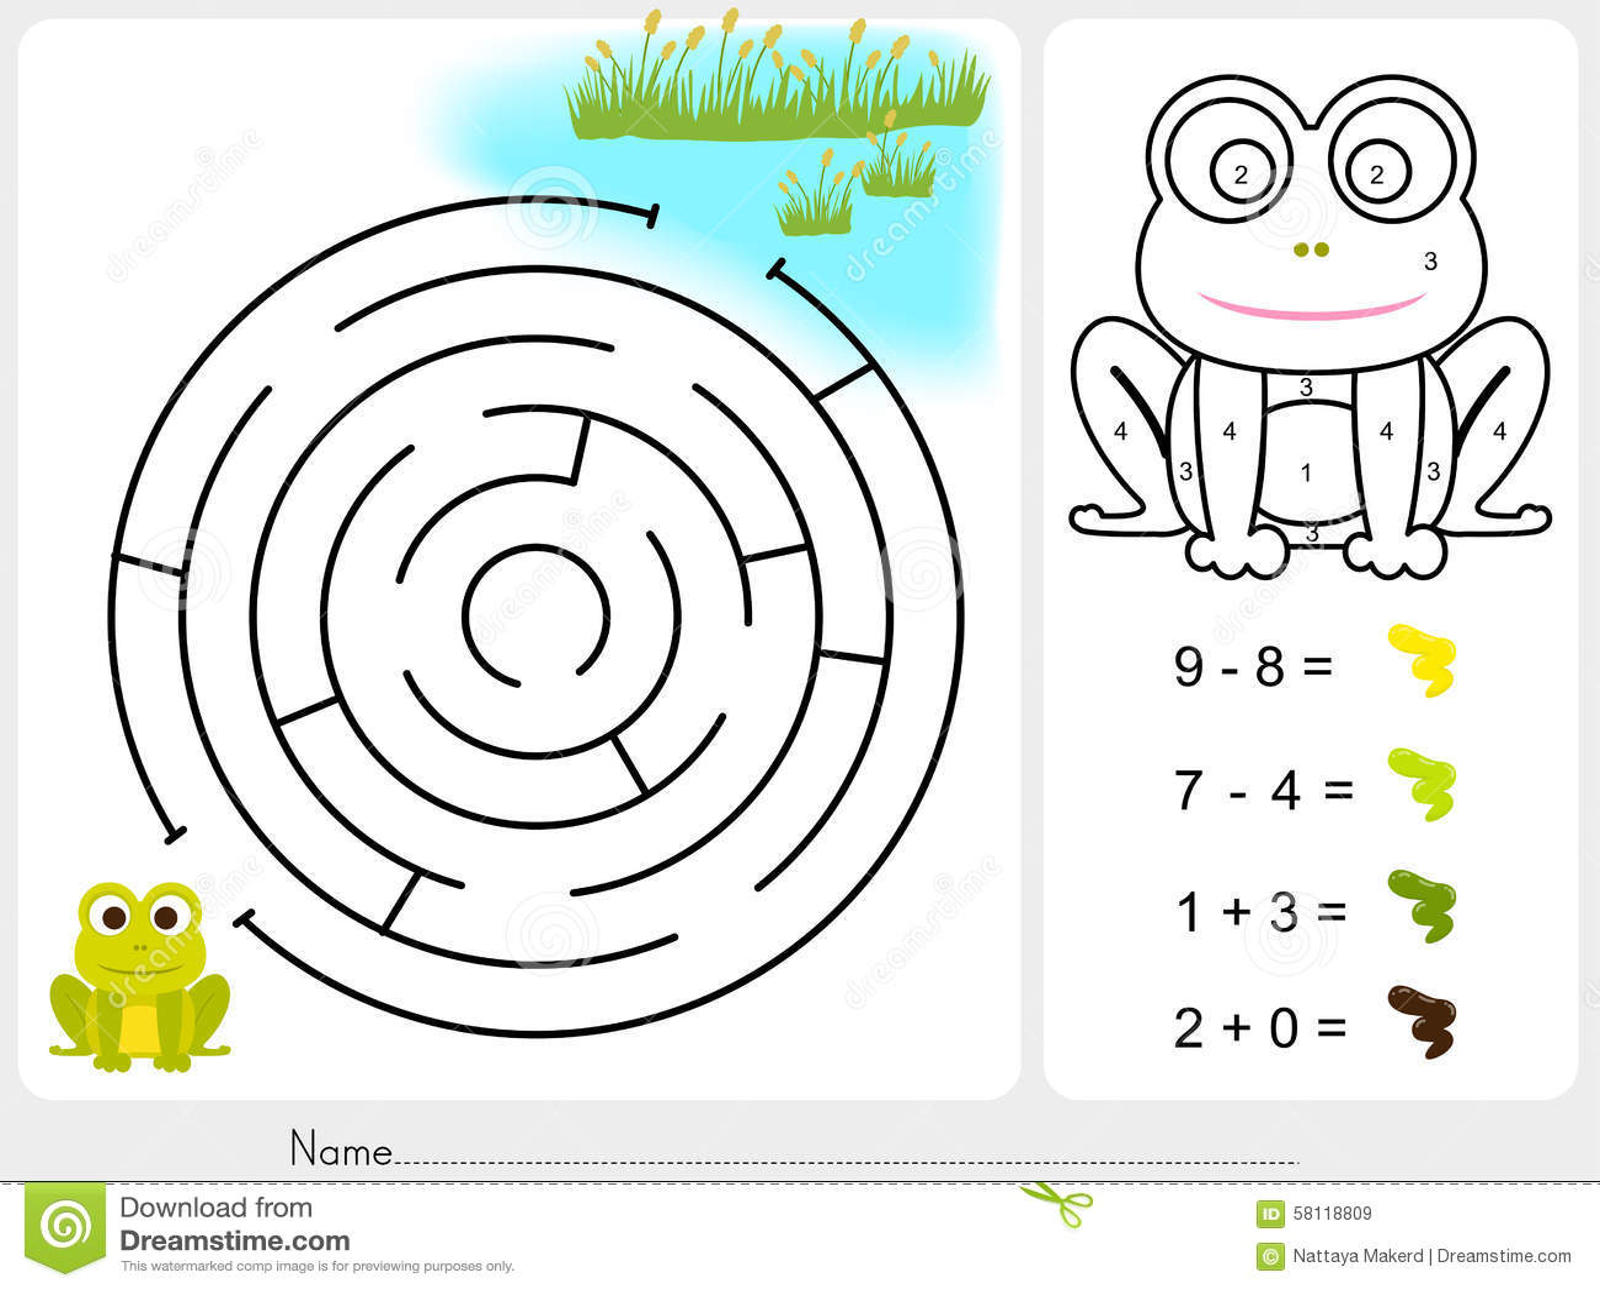 labyrinthspiel farbenfarbe durch zahlen arbeitsblatt f r bildung vektor abbildung. Black Bedroom Furniture Sets. Home Design Ideas